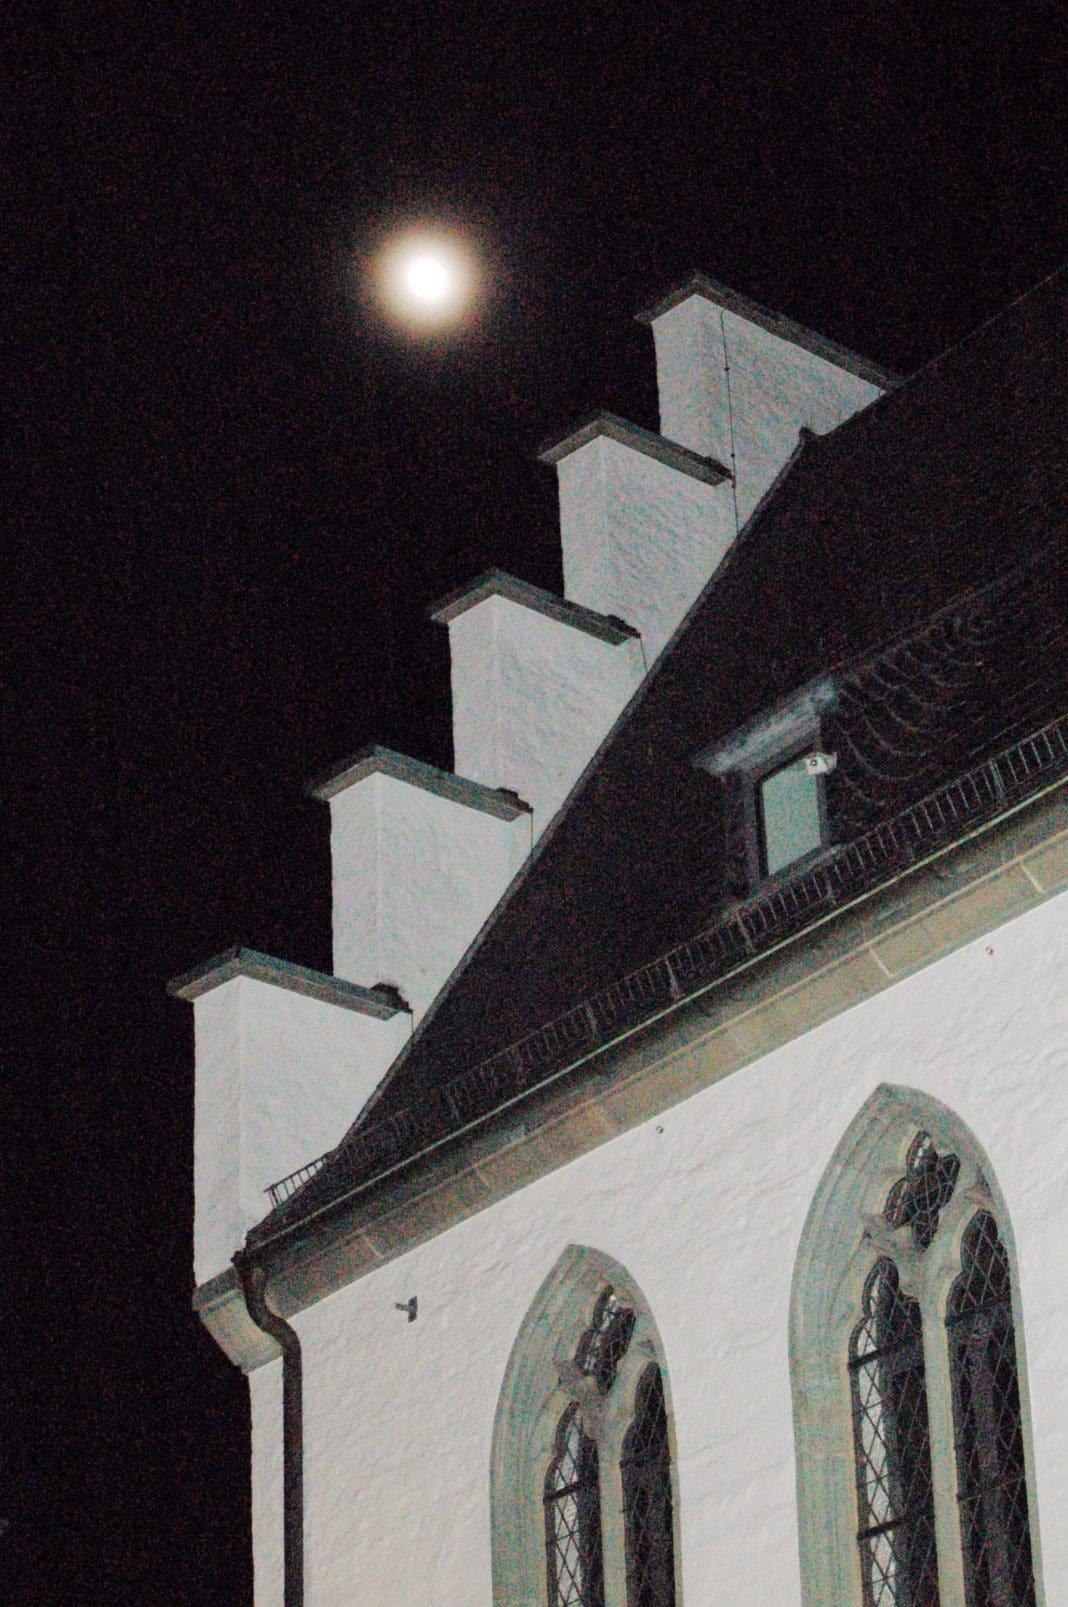 Museum im Mond: M. Löcken, Südsauerlandmuseum